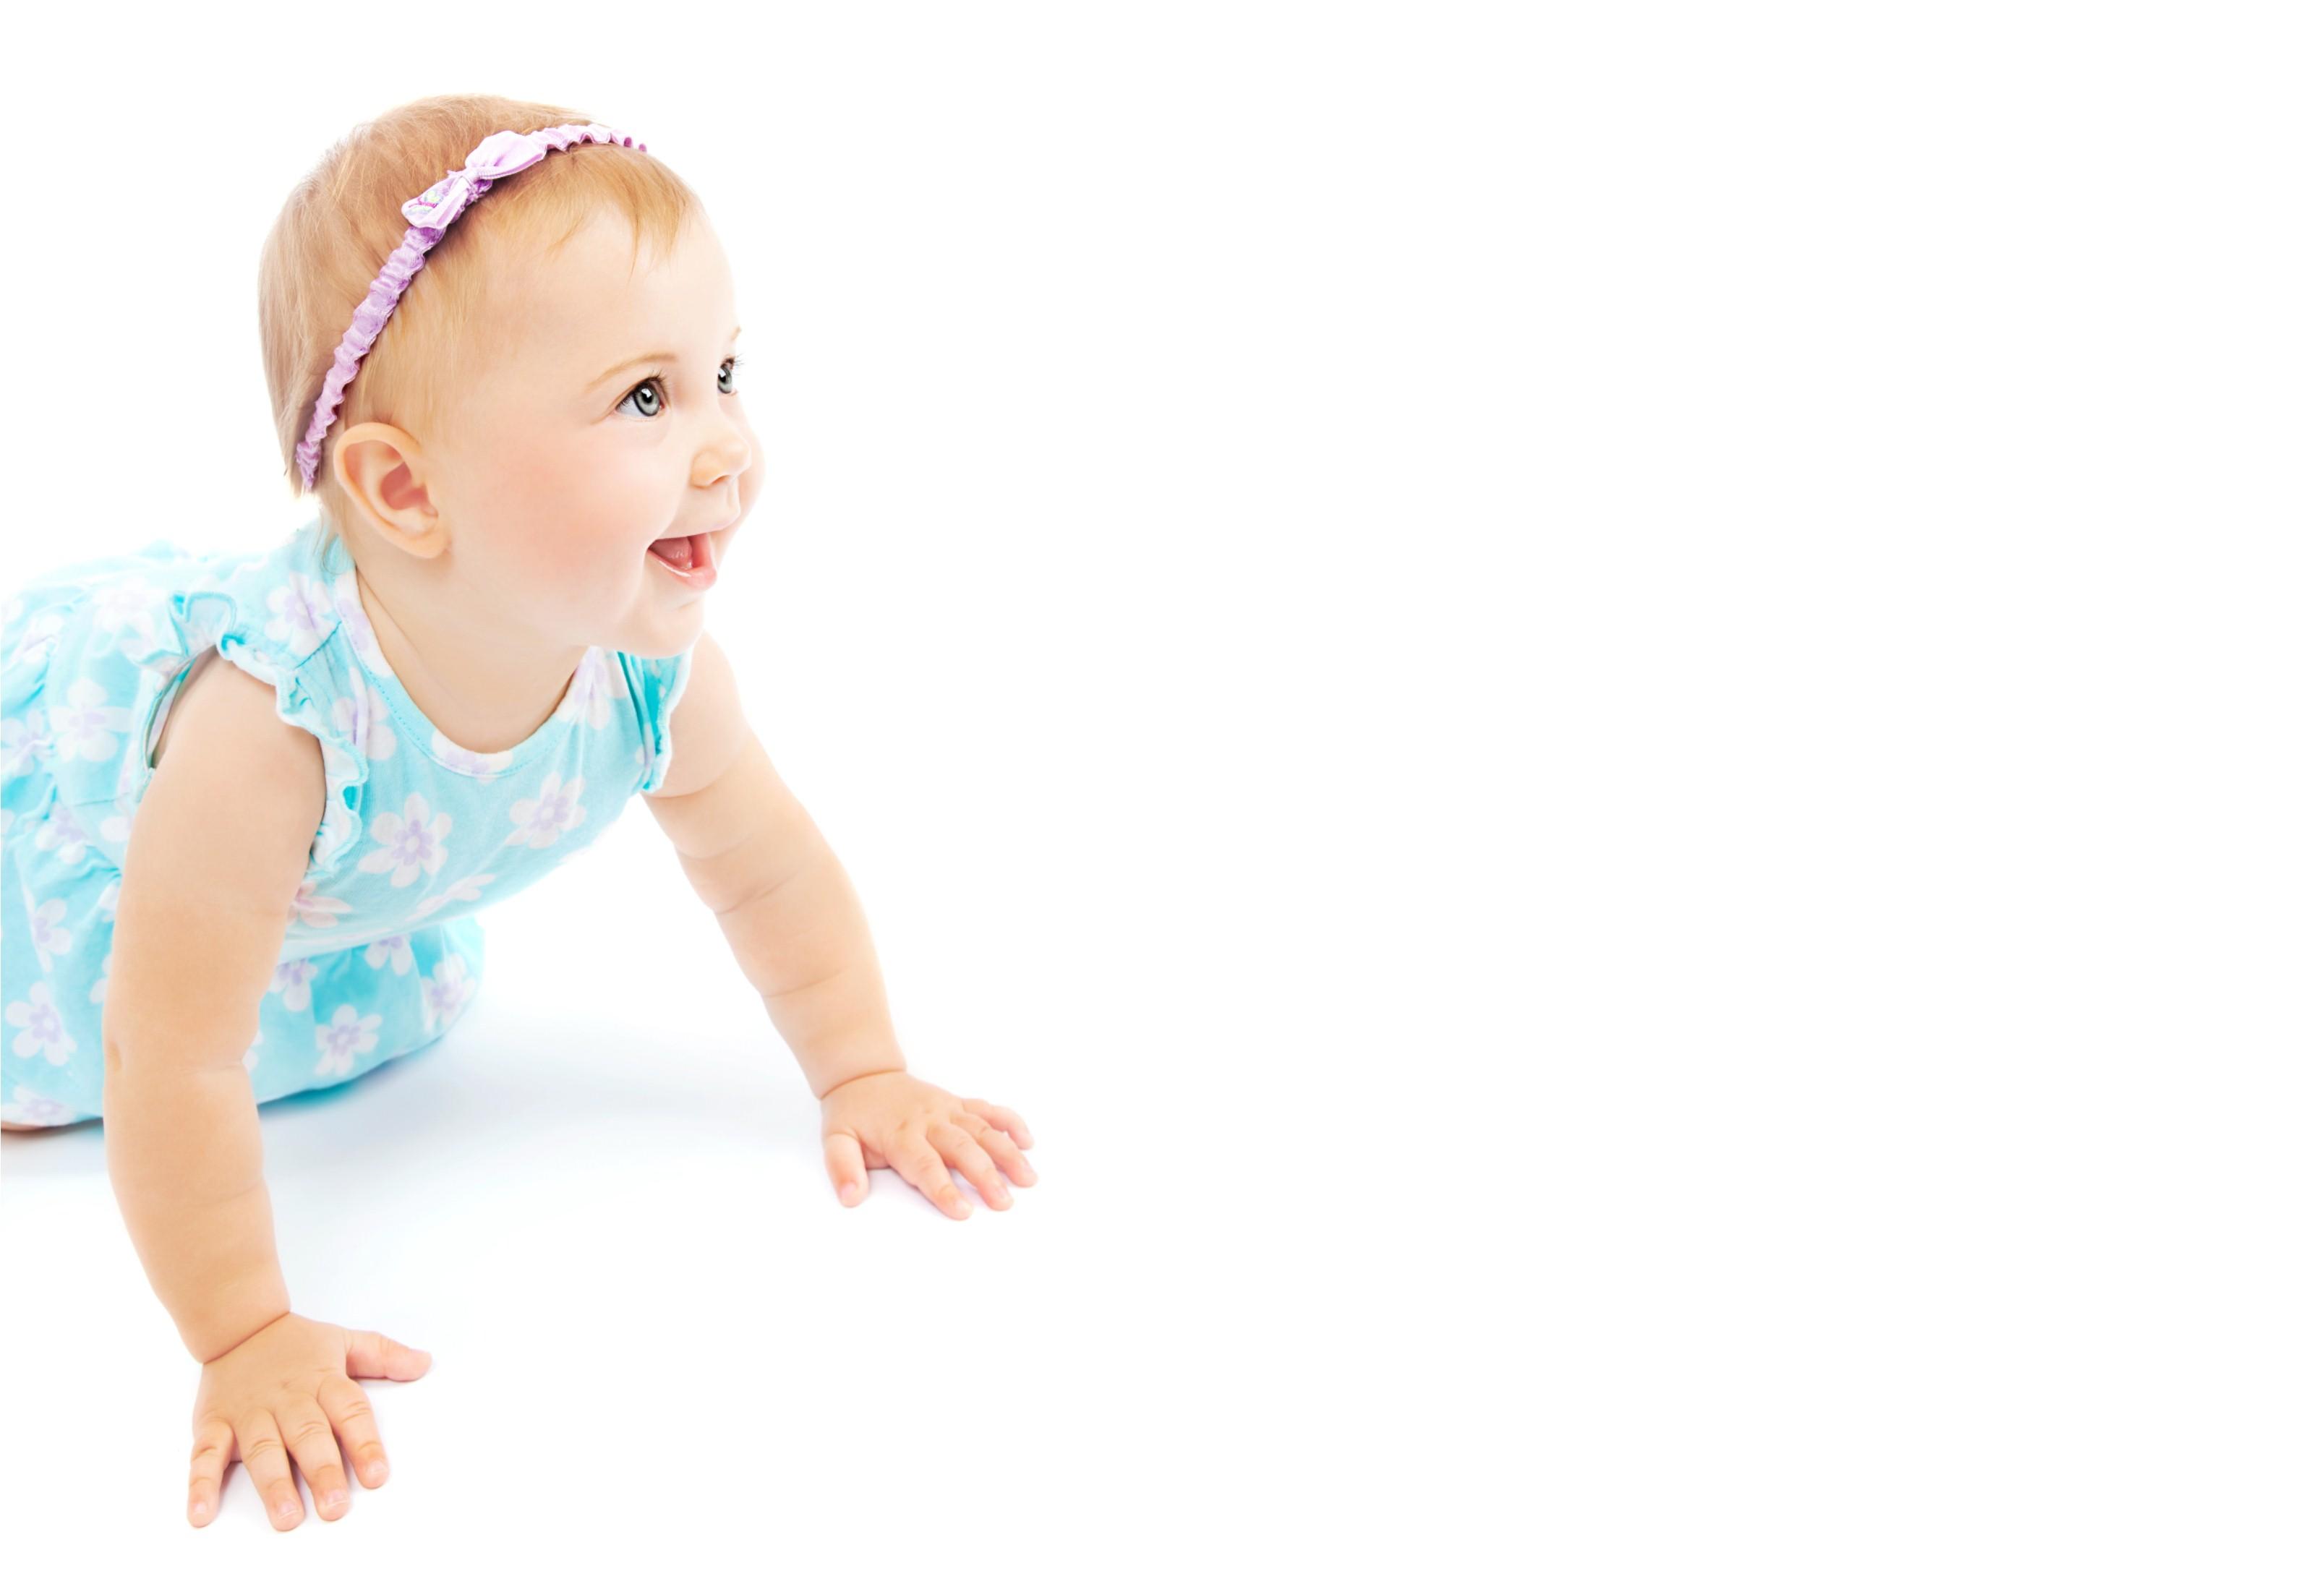 MEDIUM TO LARGE CHILDCARE BUSINESS